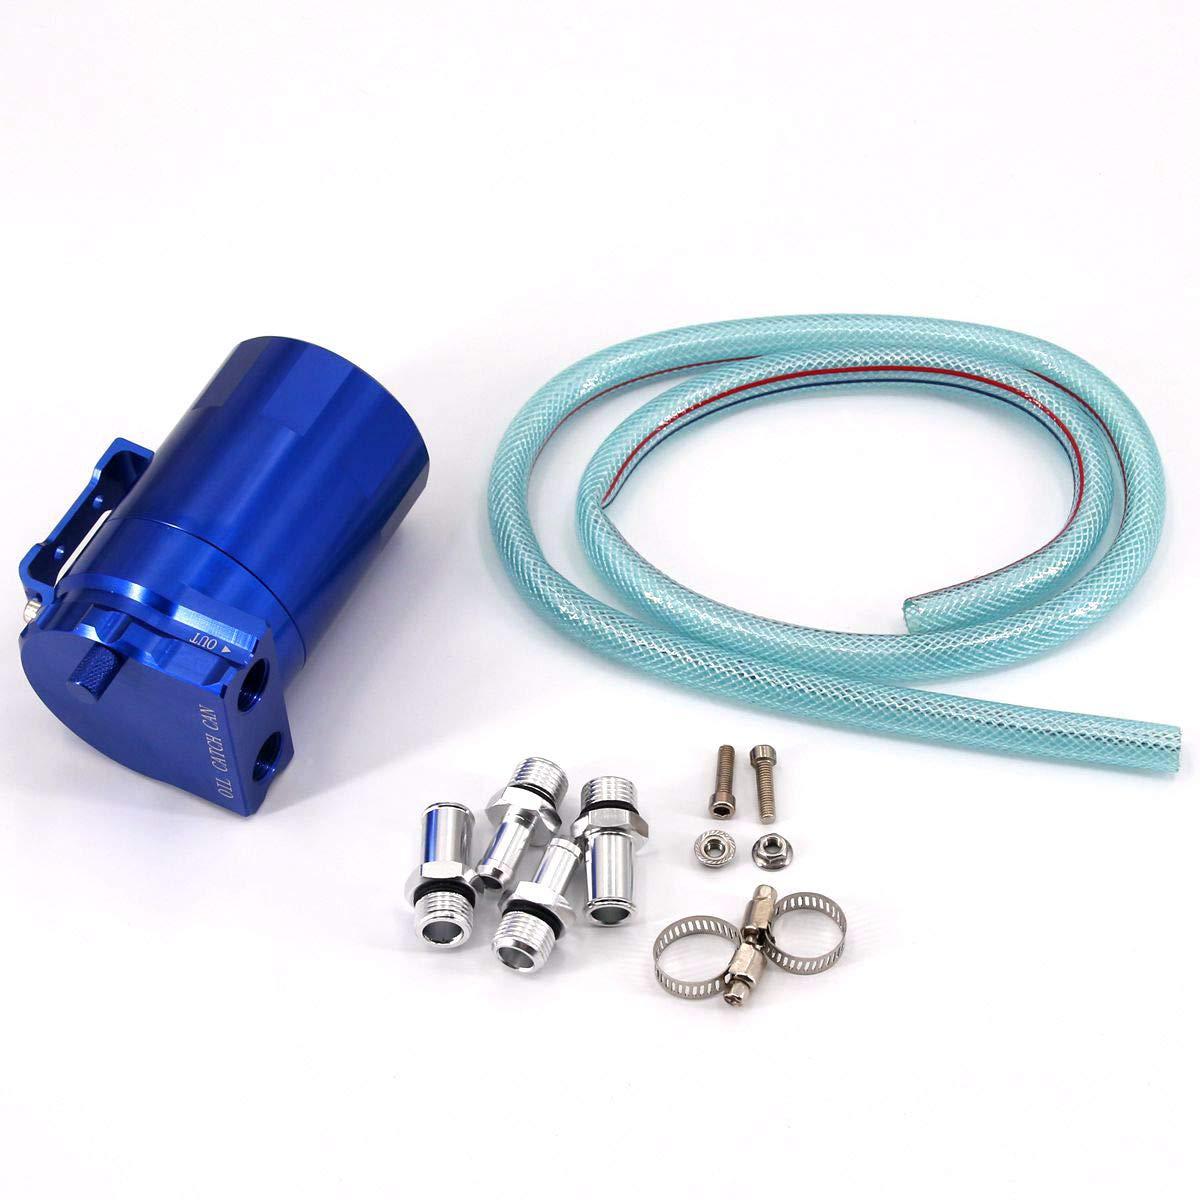 SUNDELY® Blue 9mm & 15mm Baffled Alloy Aluminum Oil Catch Can Reservoir Tank Universal 483720